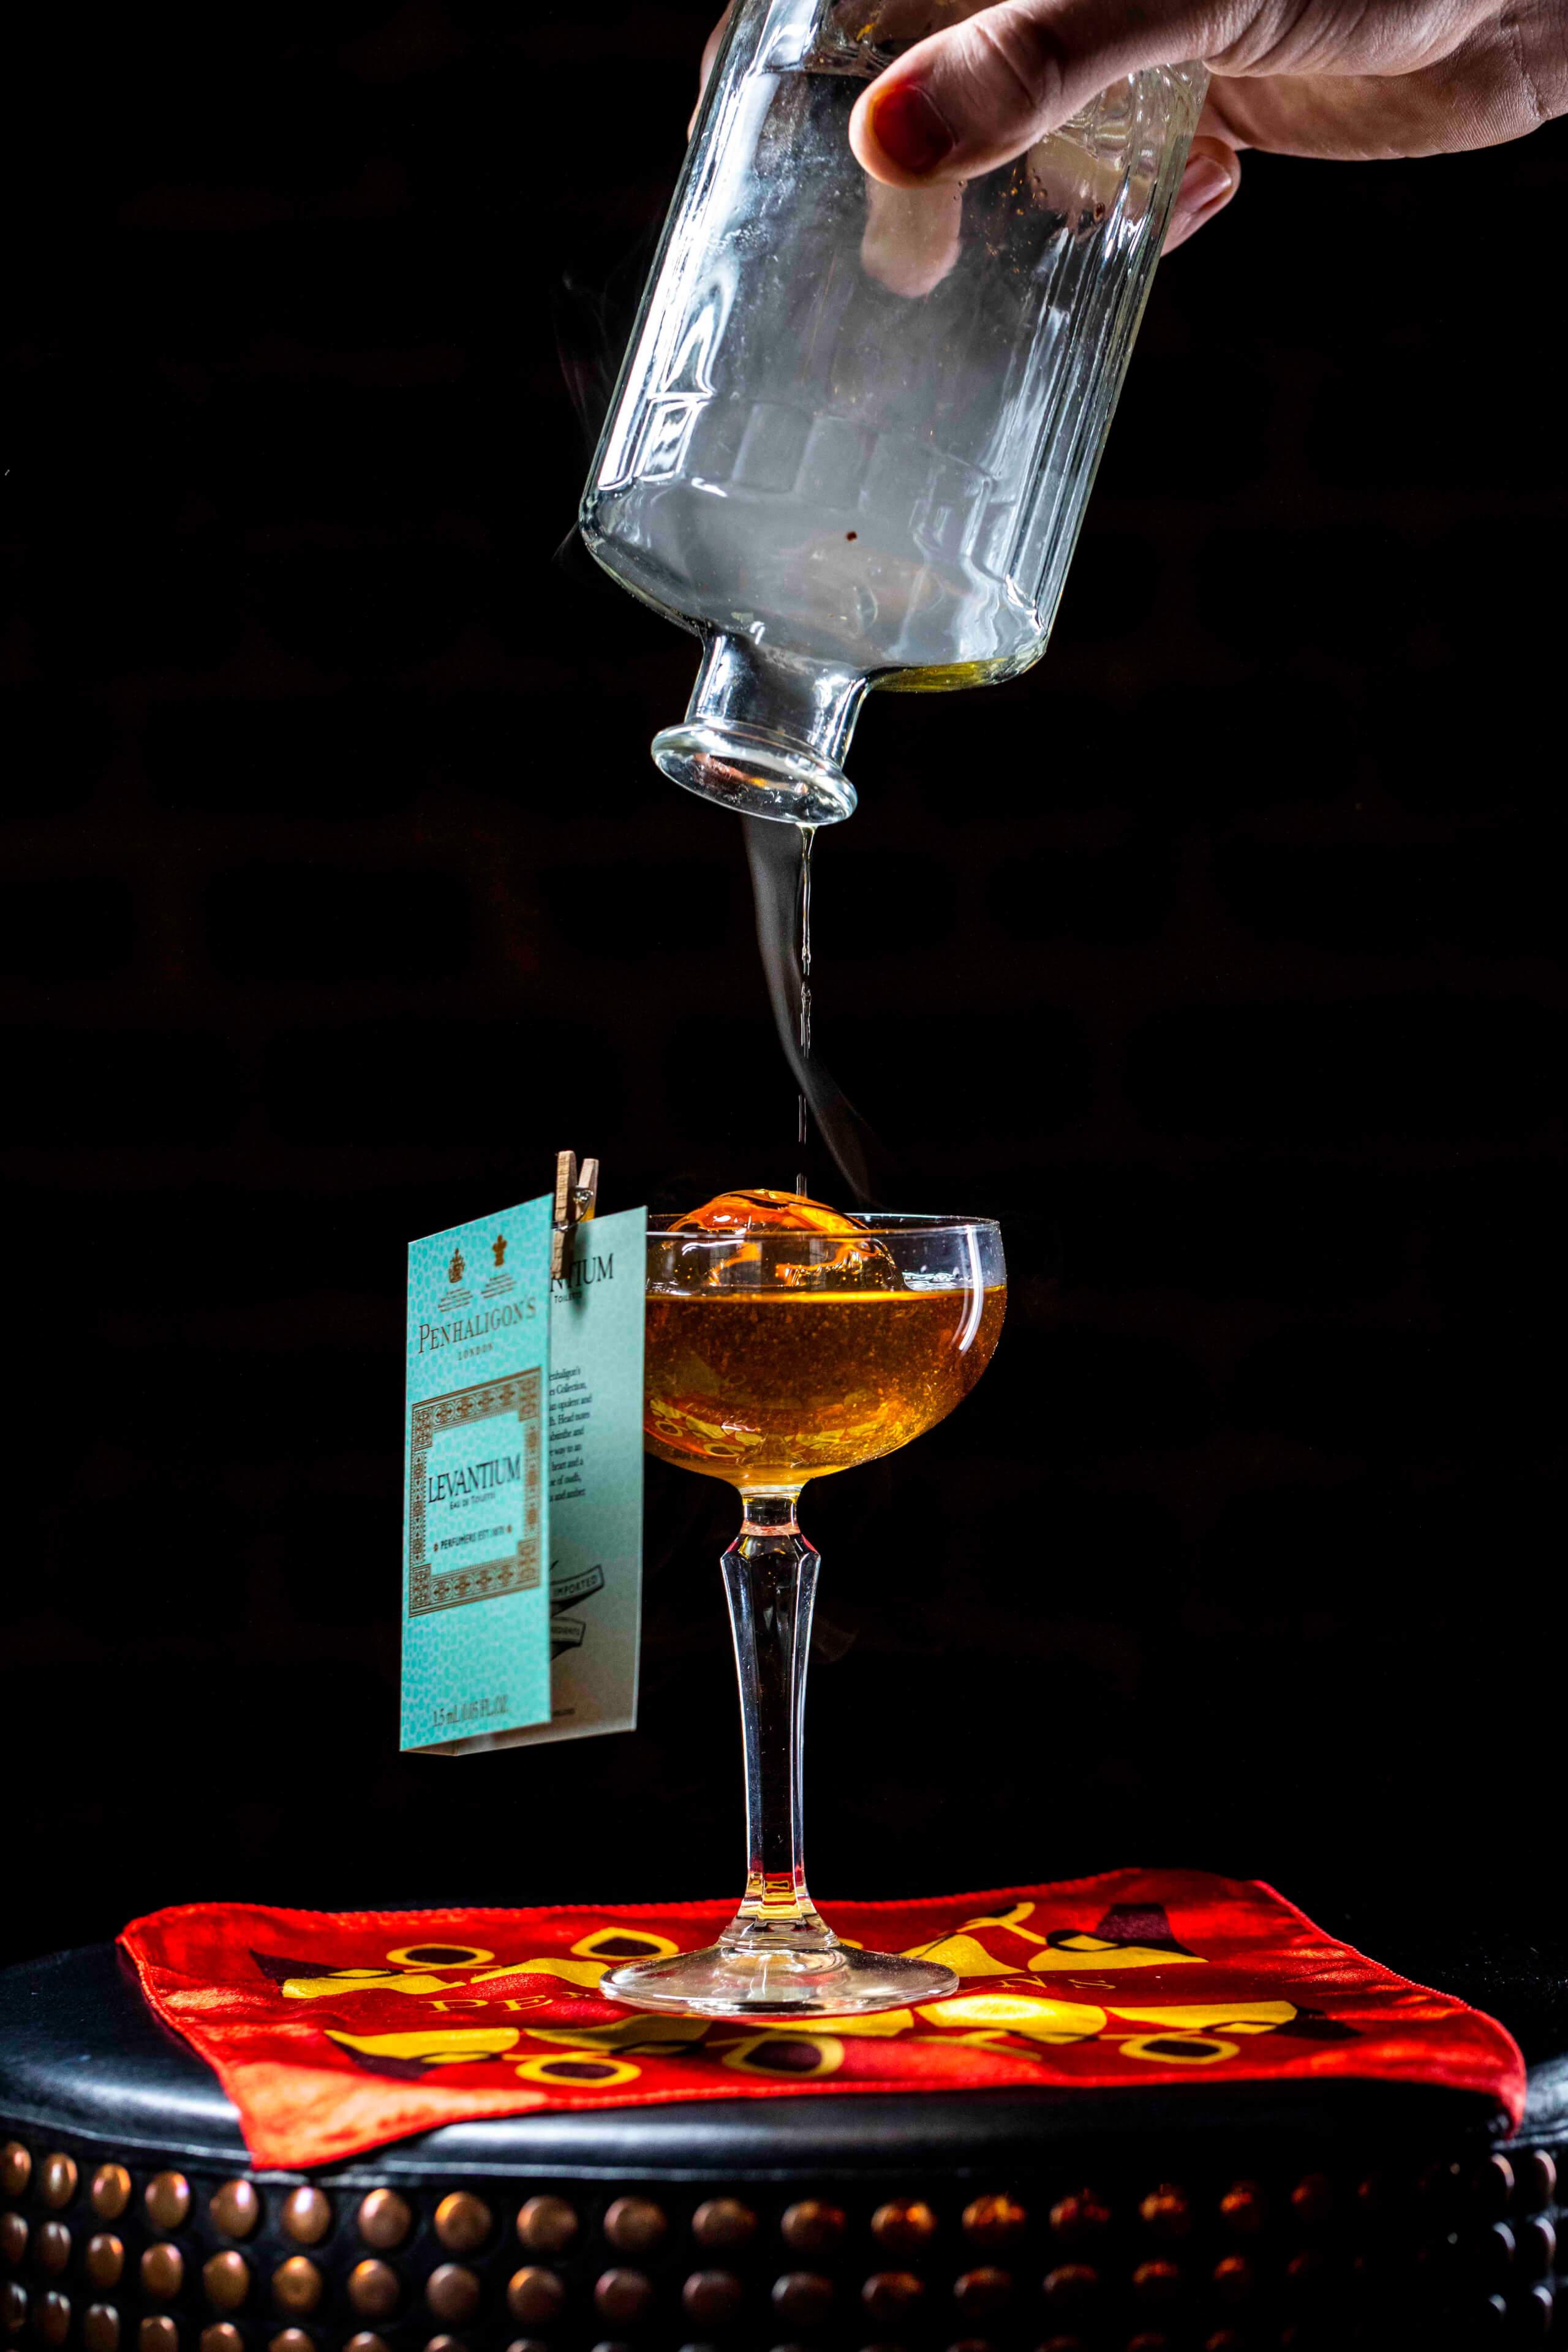 Penhaligon's_Cocktails_OBB_080_1400[1]